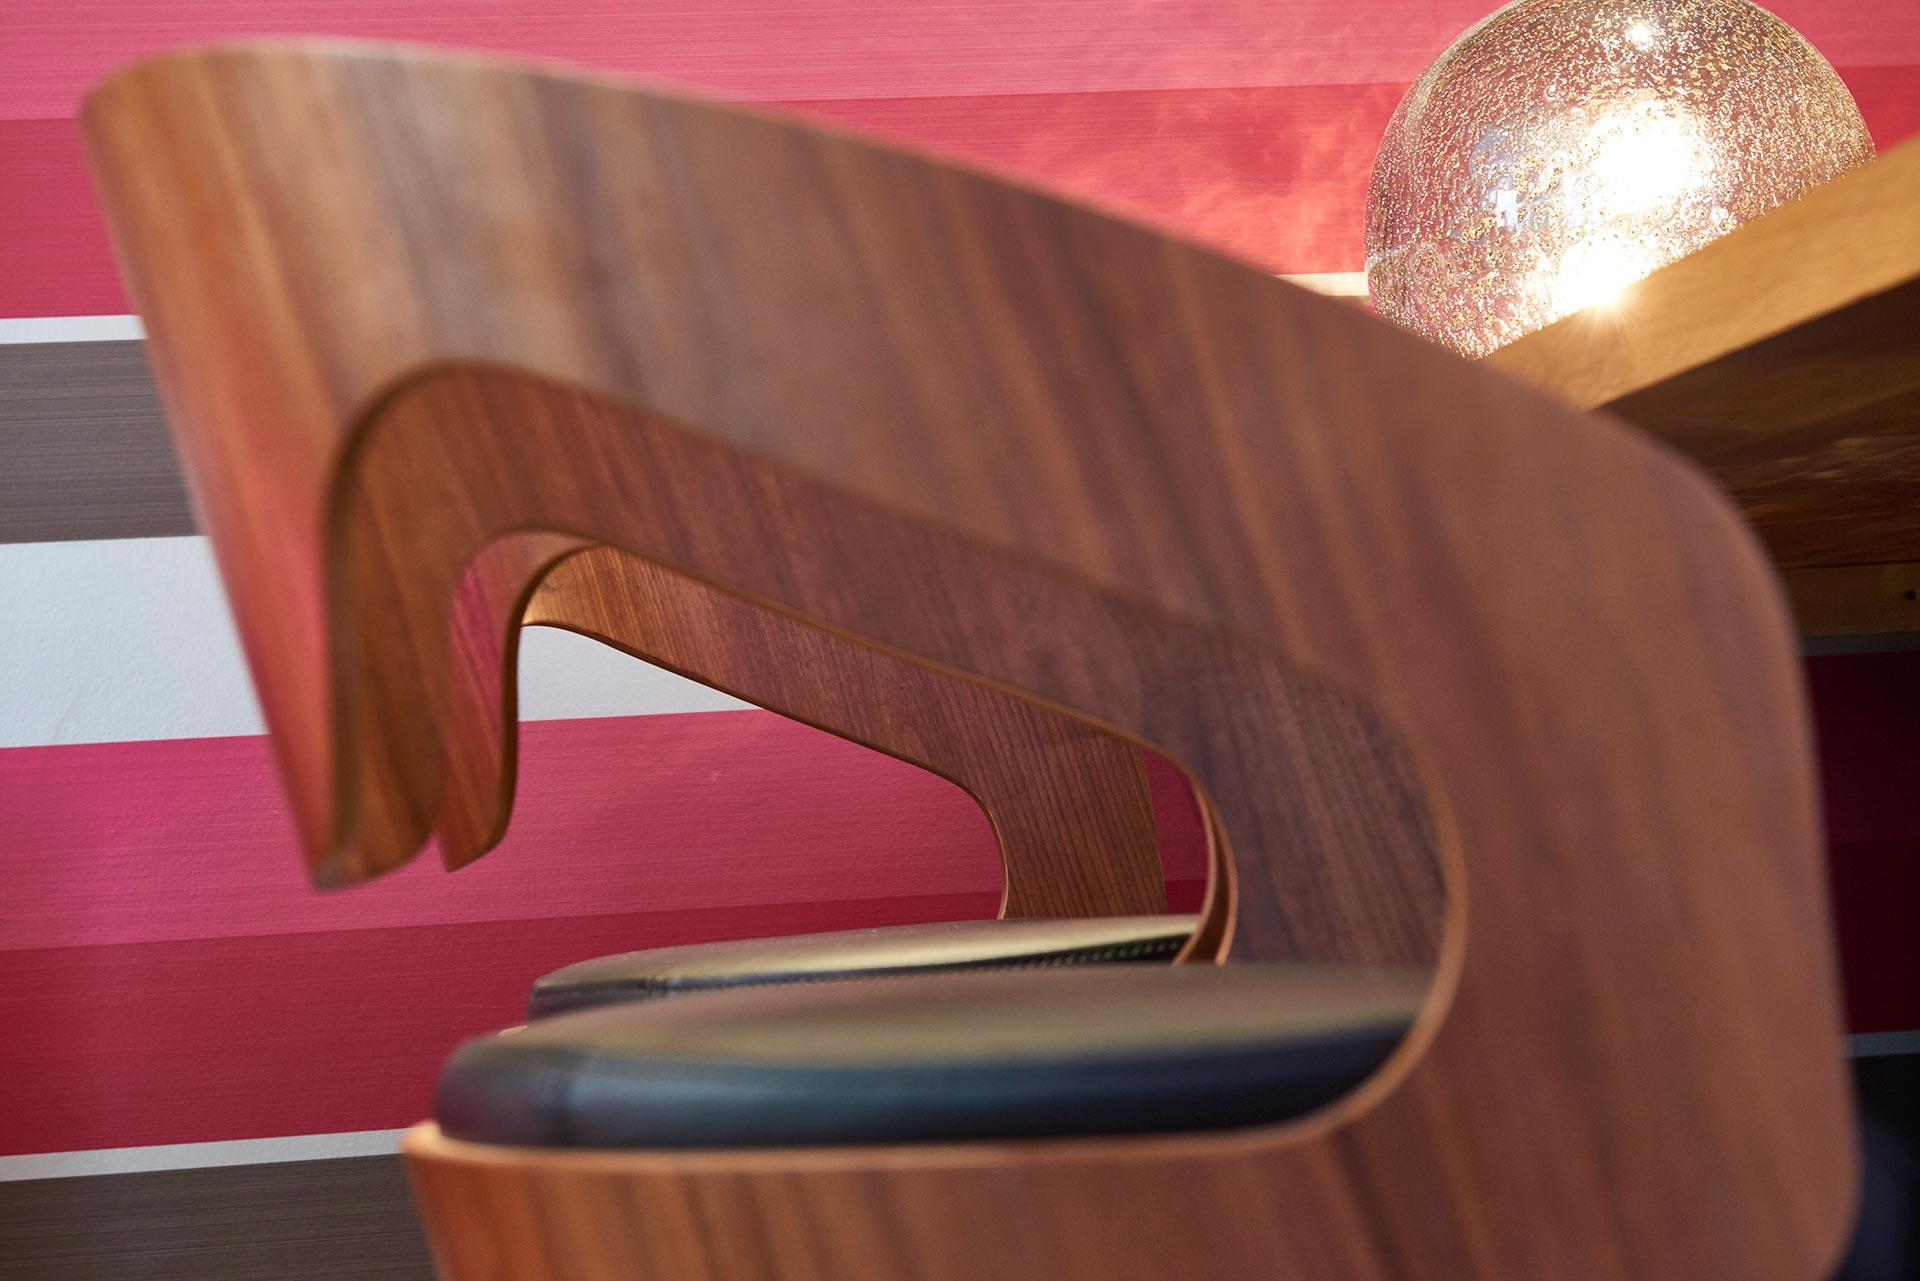 Bar stool detail